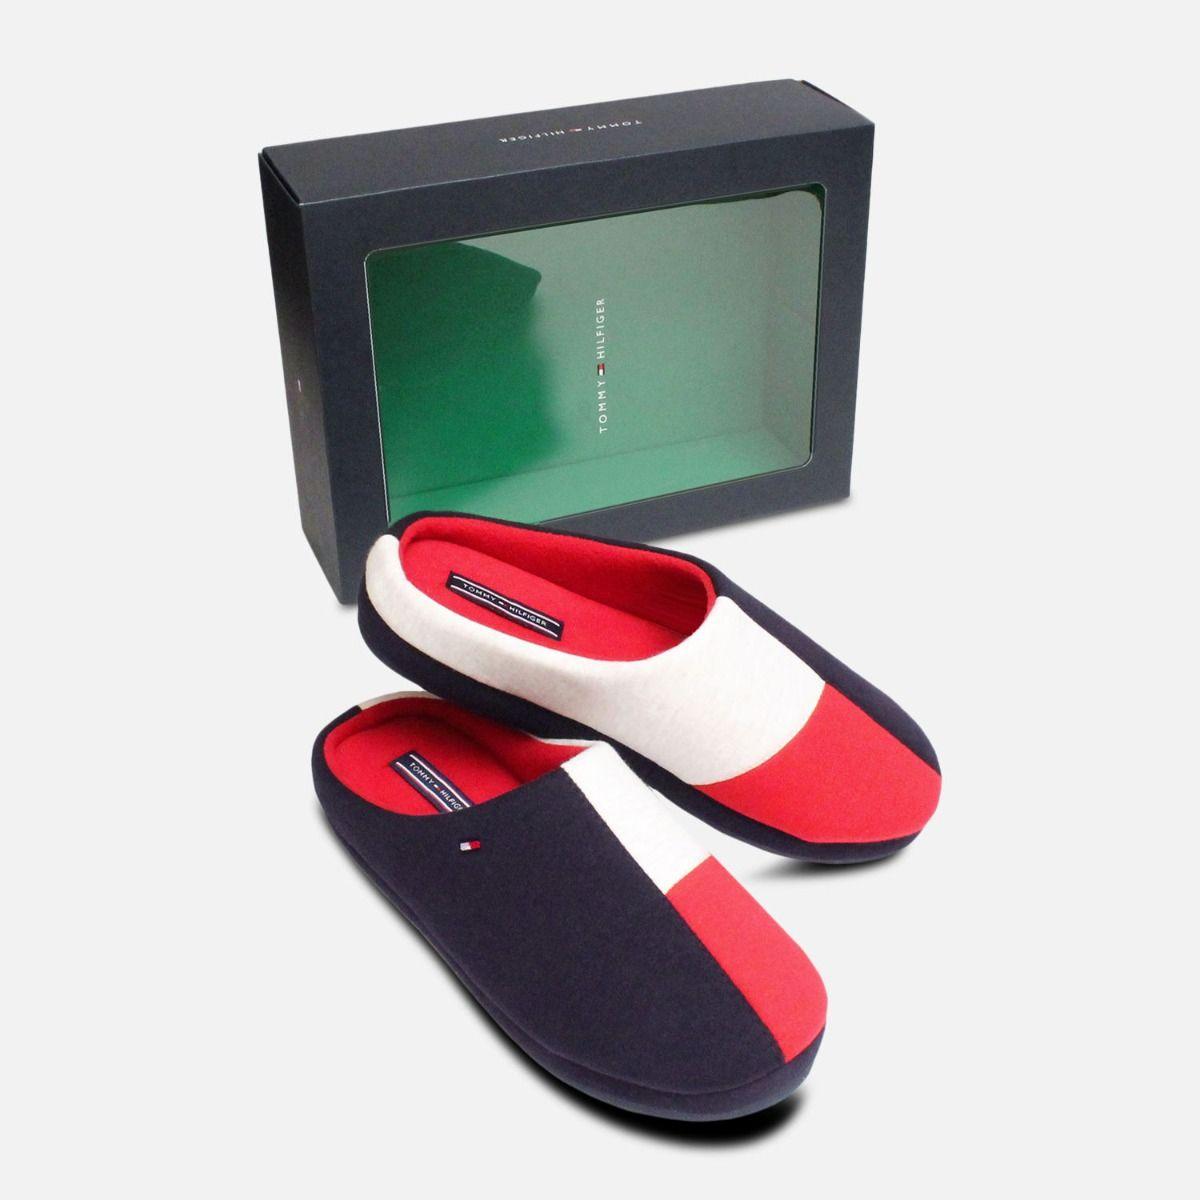 fd42b3c33 Tommy Hilfiger Iconic Luxury Slipper   Gift Box